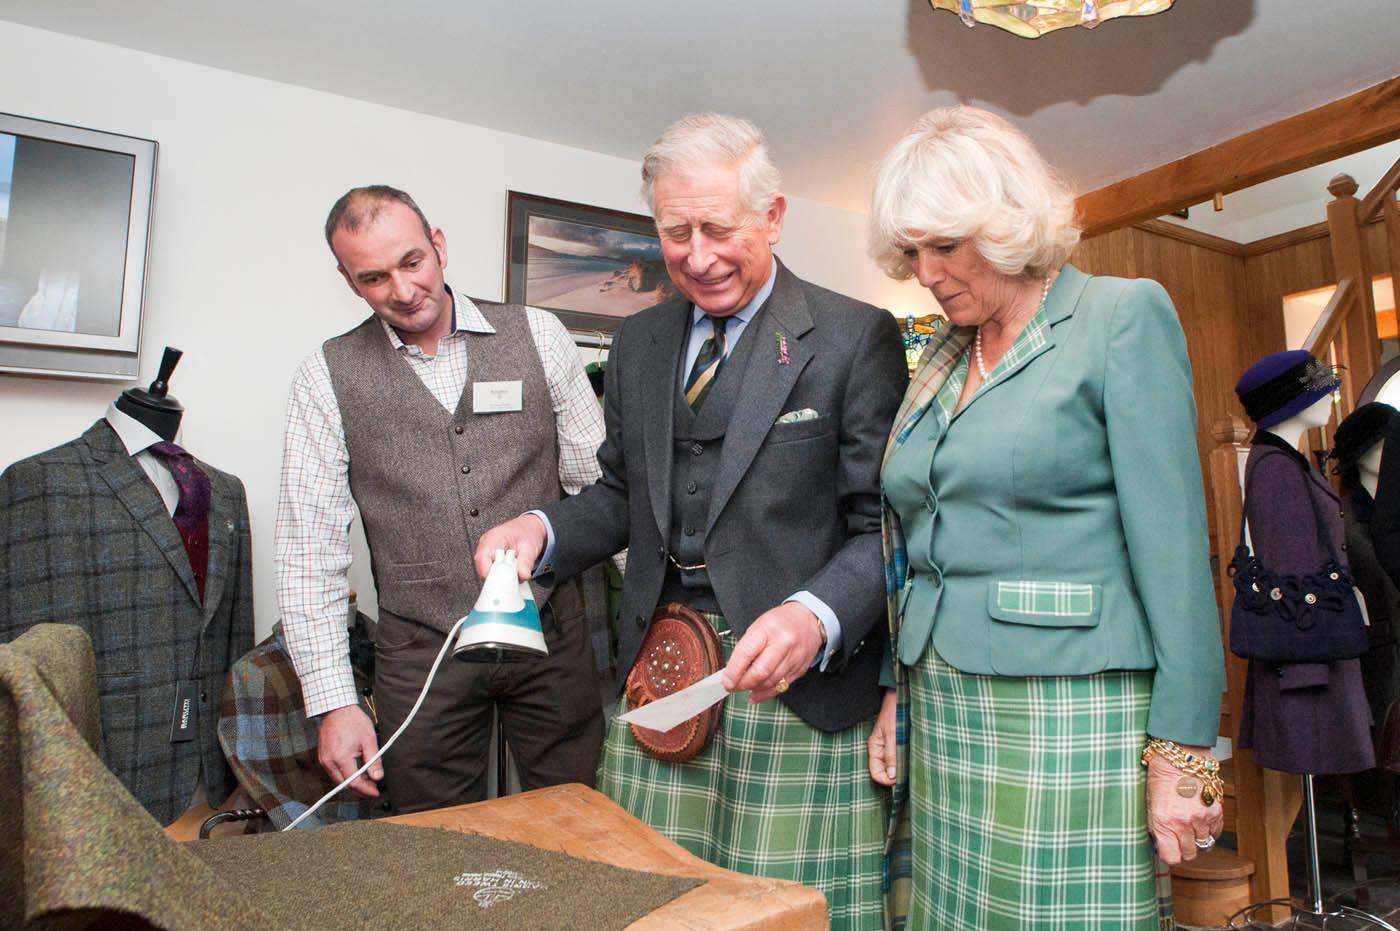 Prince Charles ironing Orb onto Harris Tweed